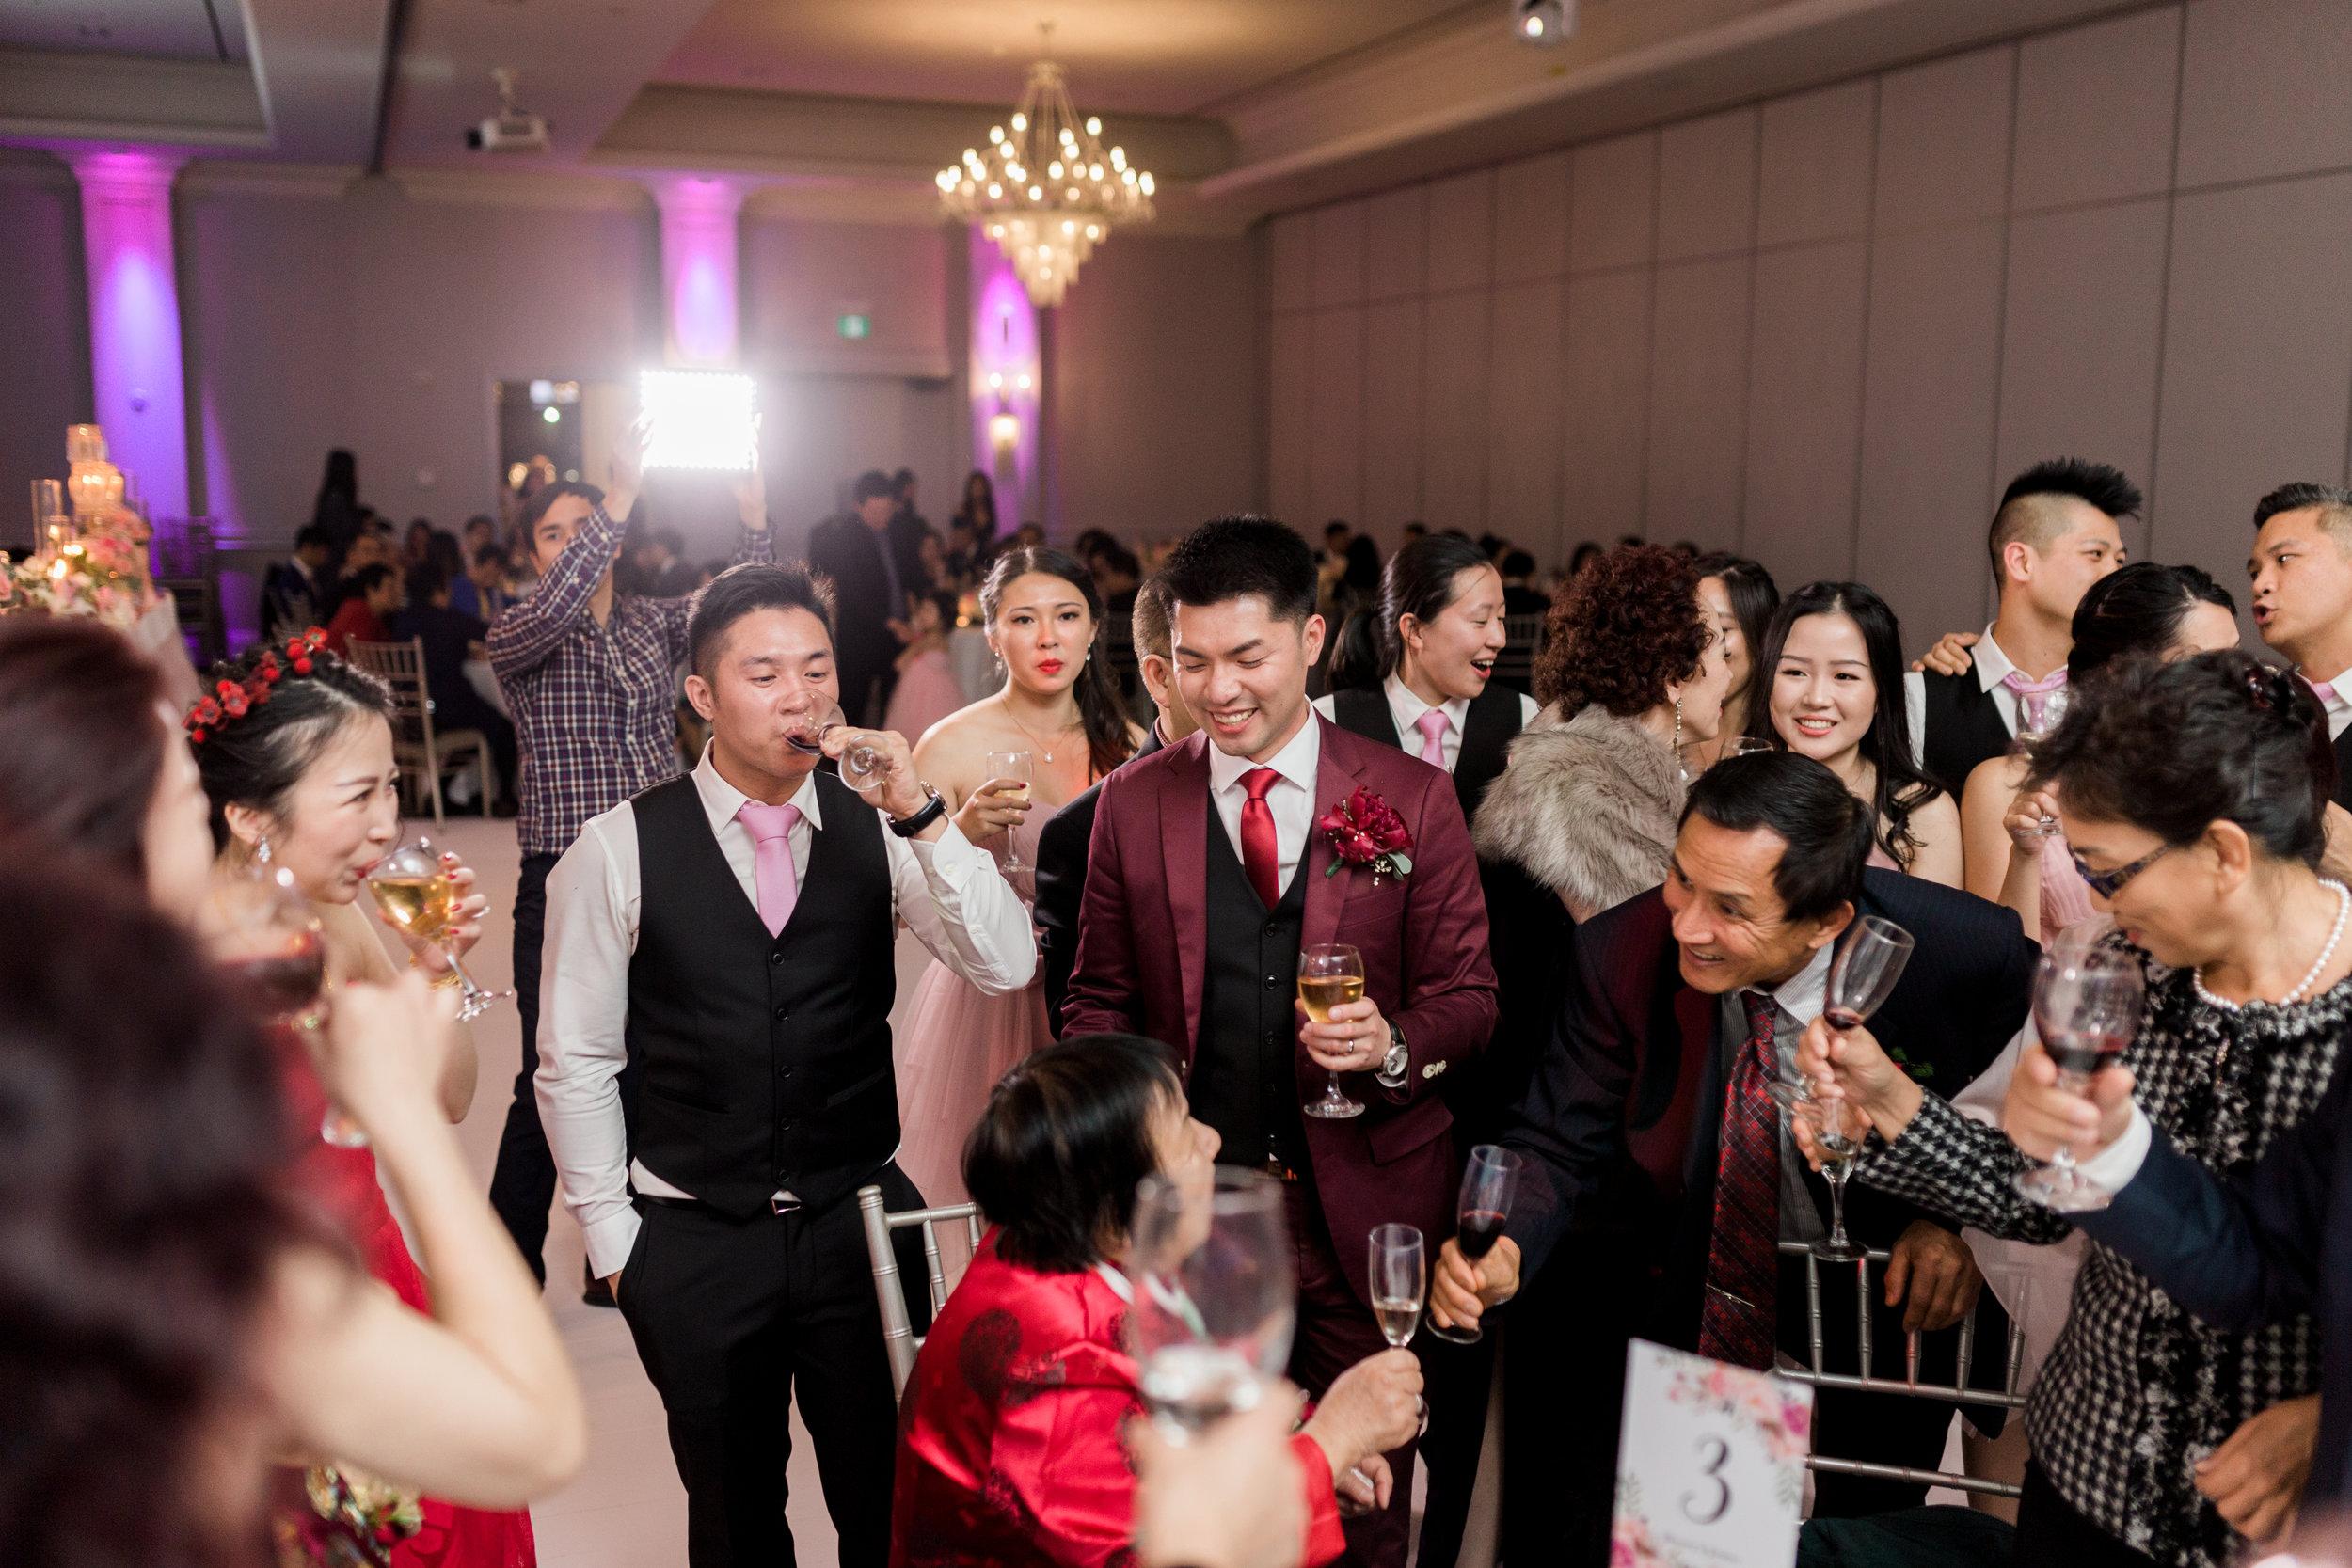 Parkview Manor Wedding - Reception-199.jpg